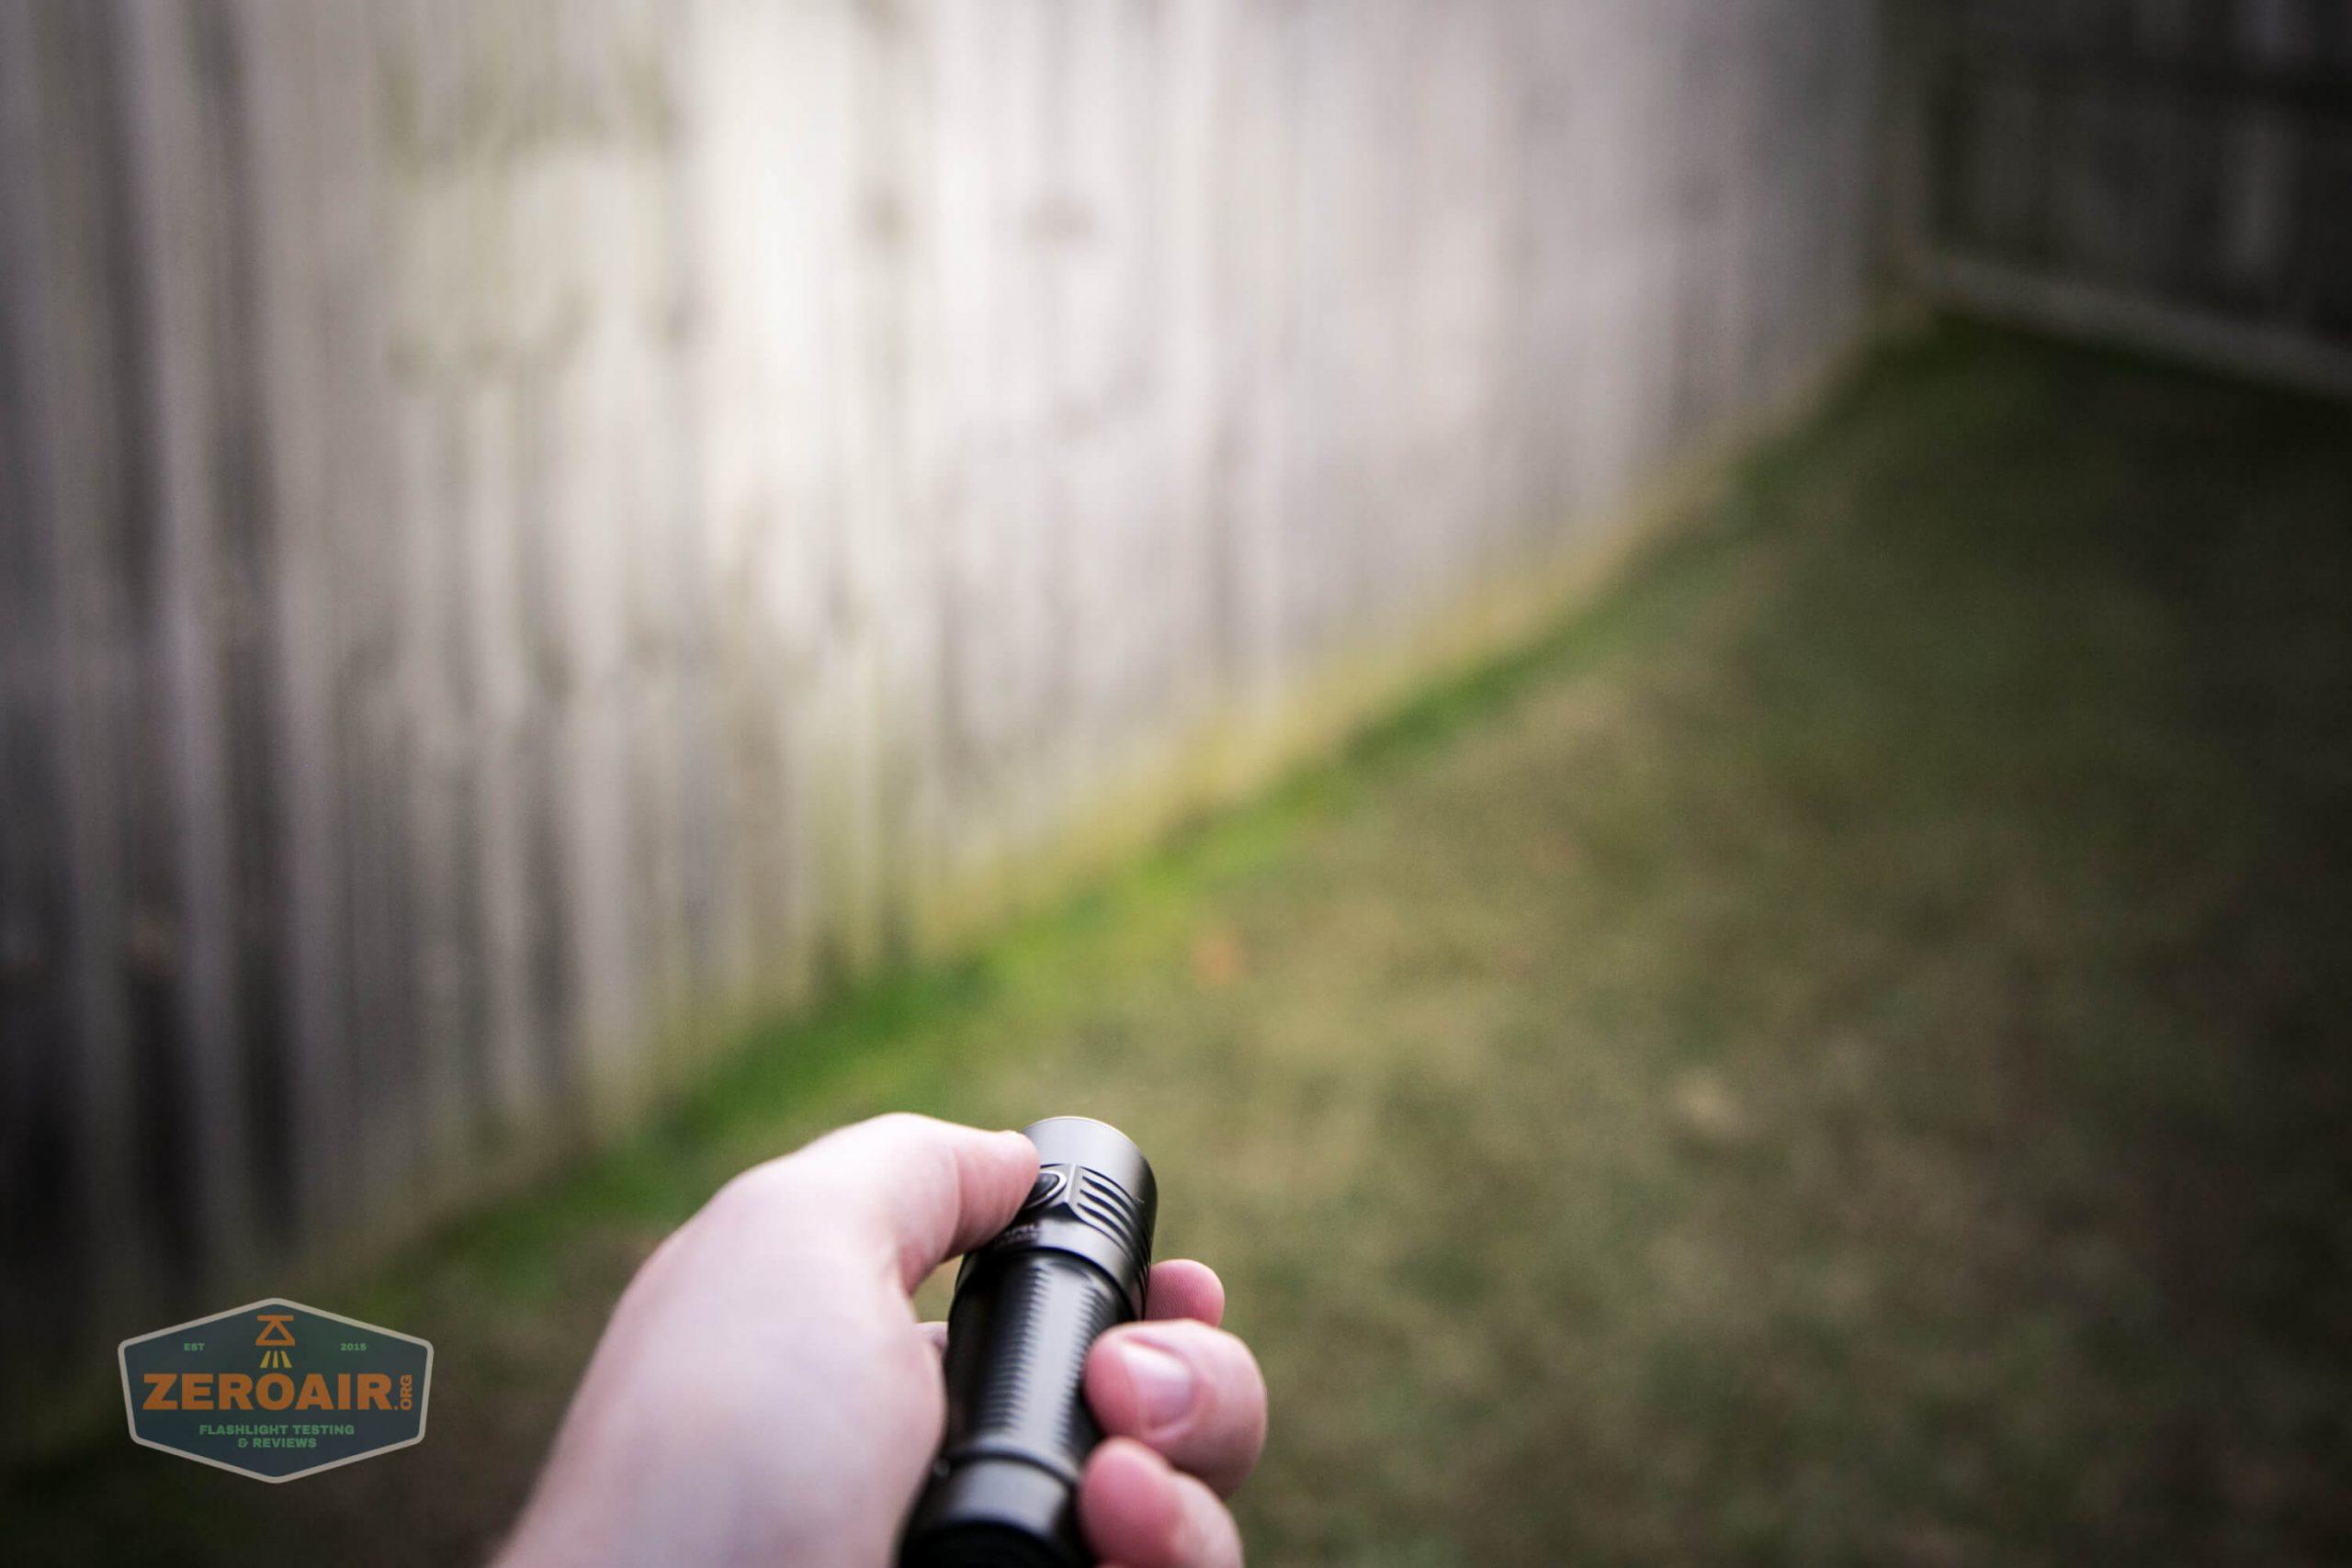 klarus g25 21700 cree xhp70.2 flashlight in hand beamshot